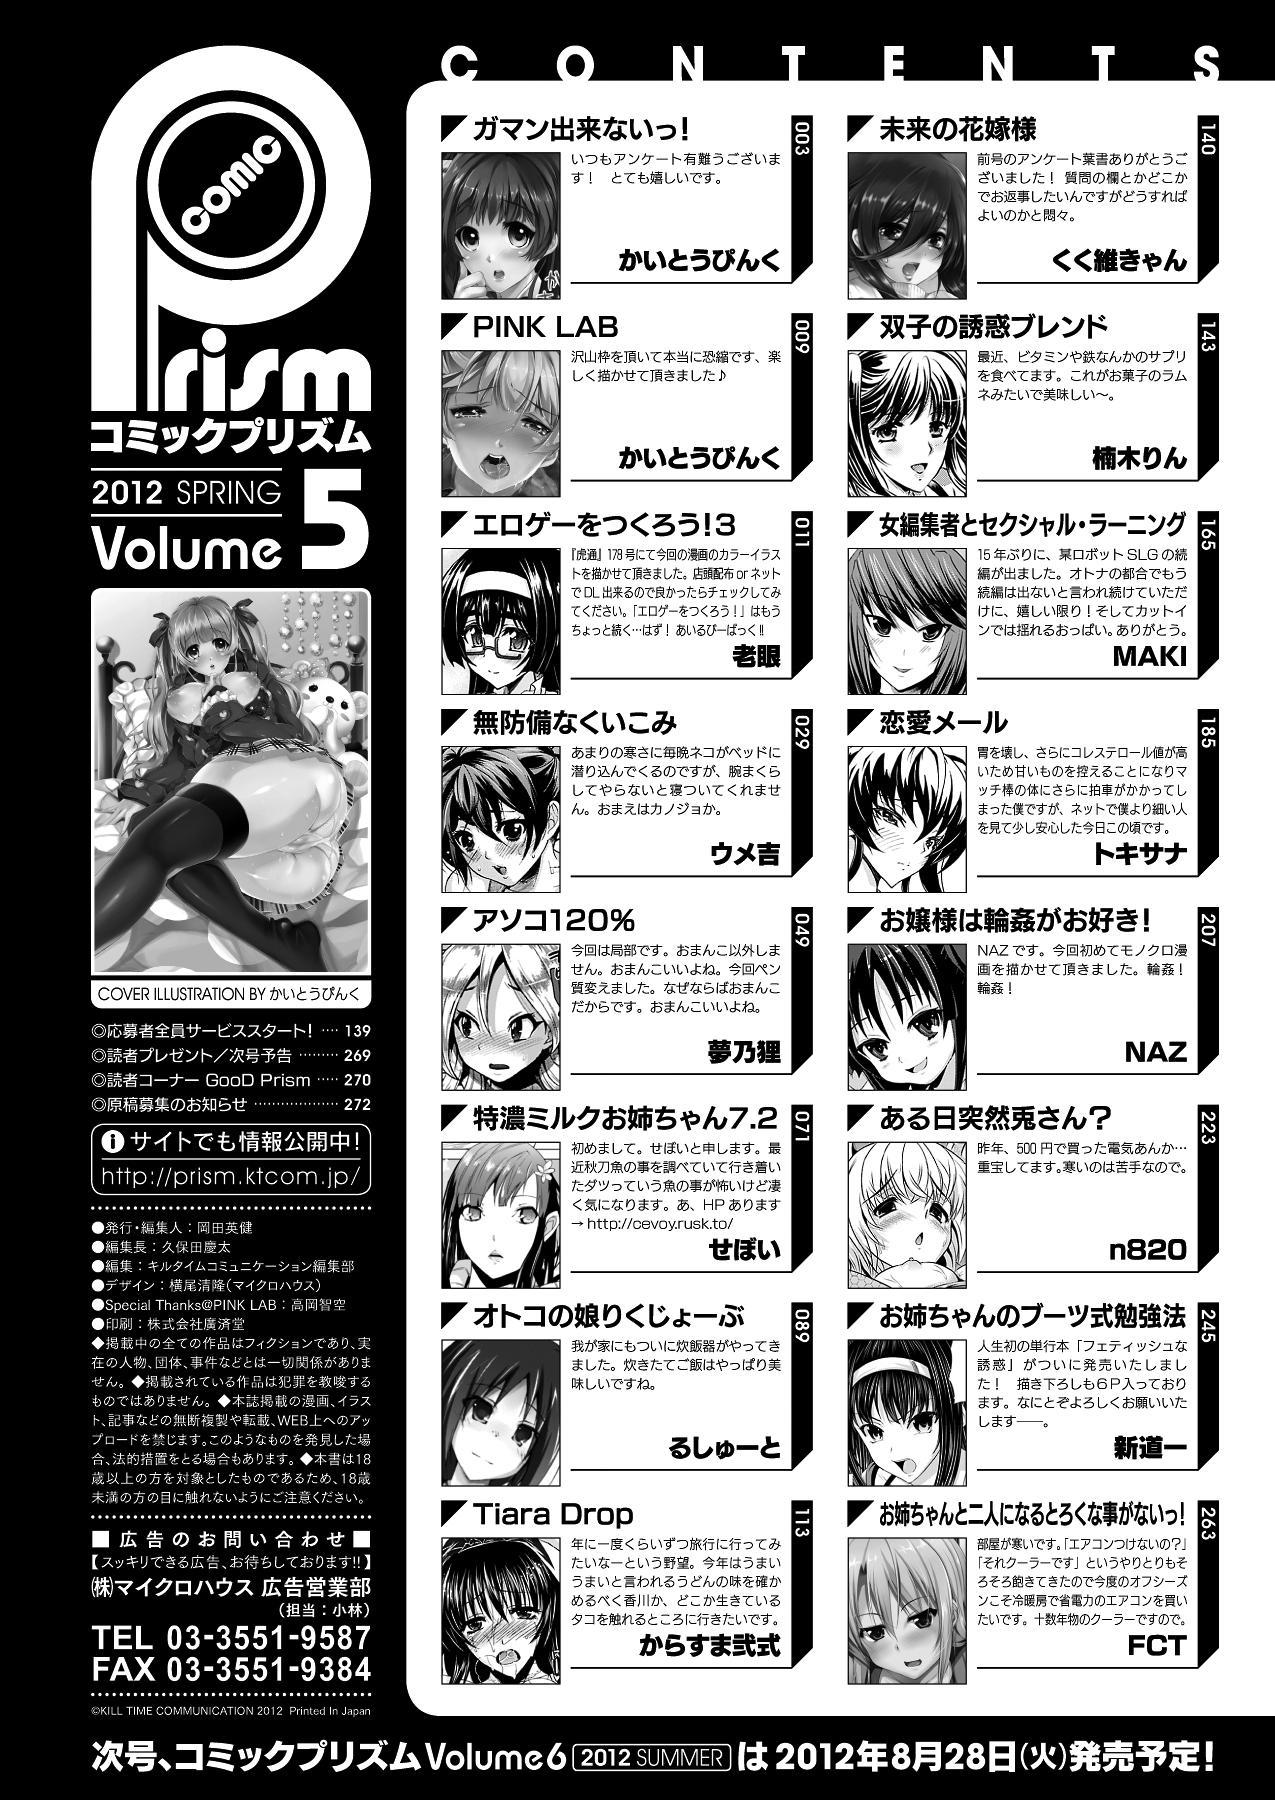 Comic Prism Vol.5 2012 SPRING 273